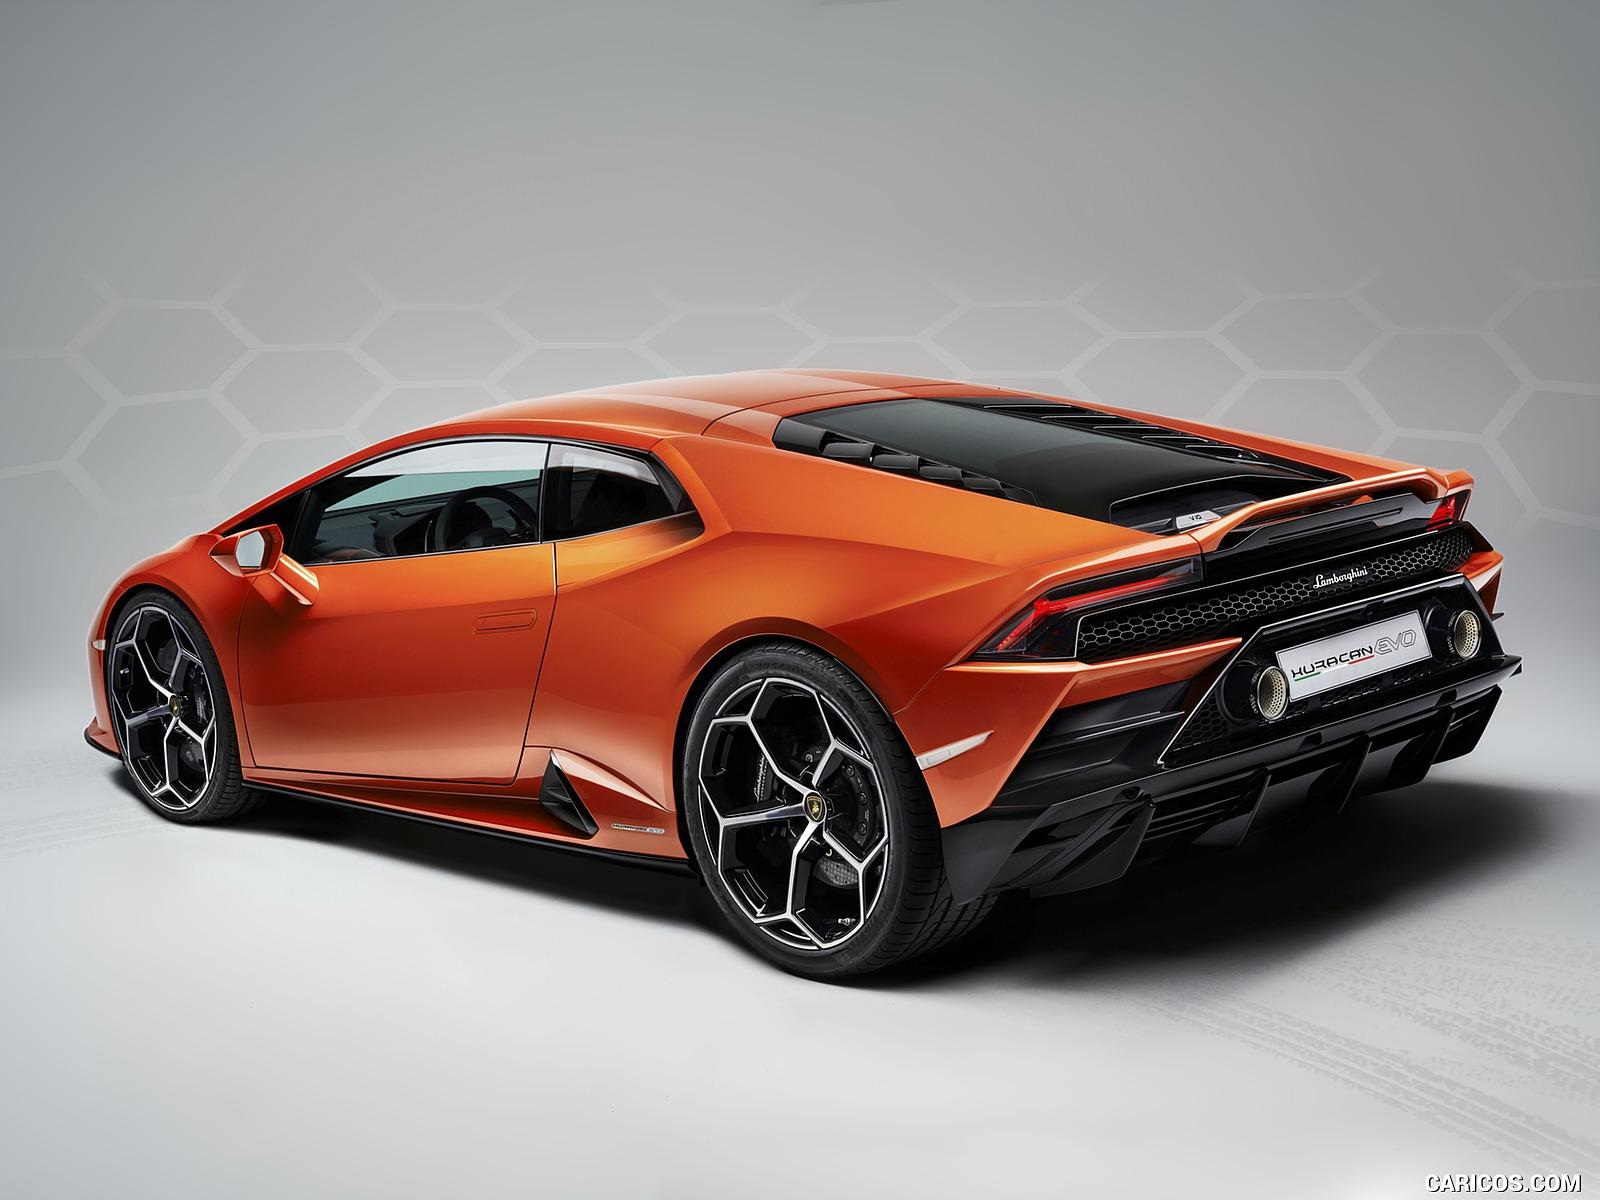 How Lamborghini is driving itself towards technology